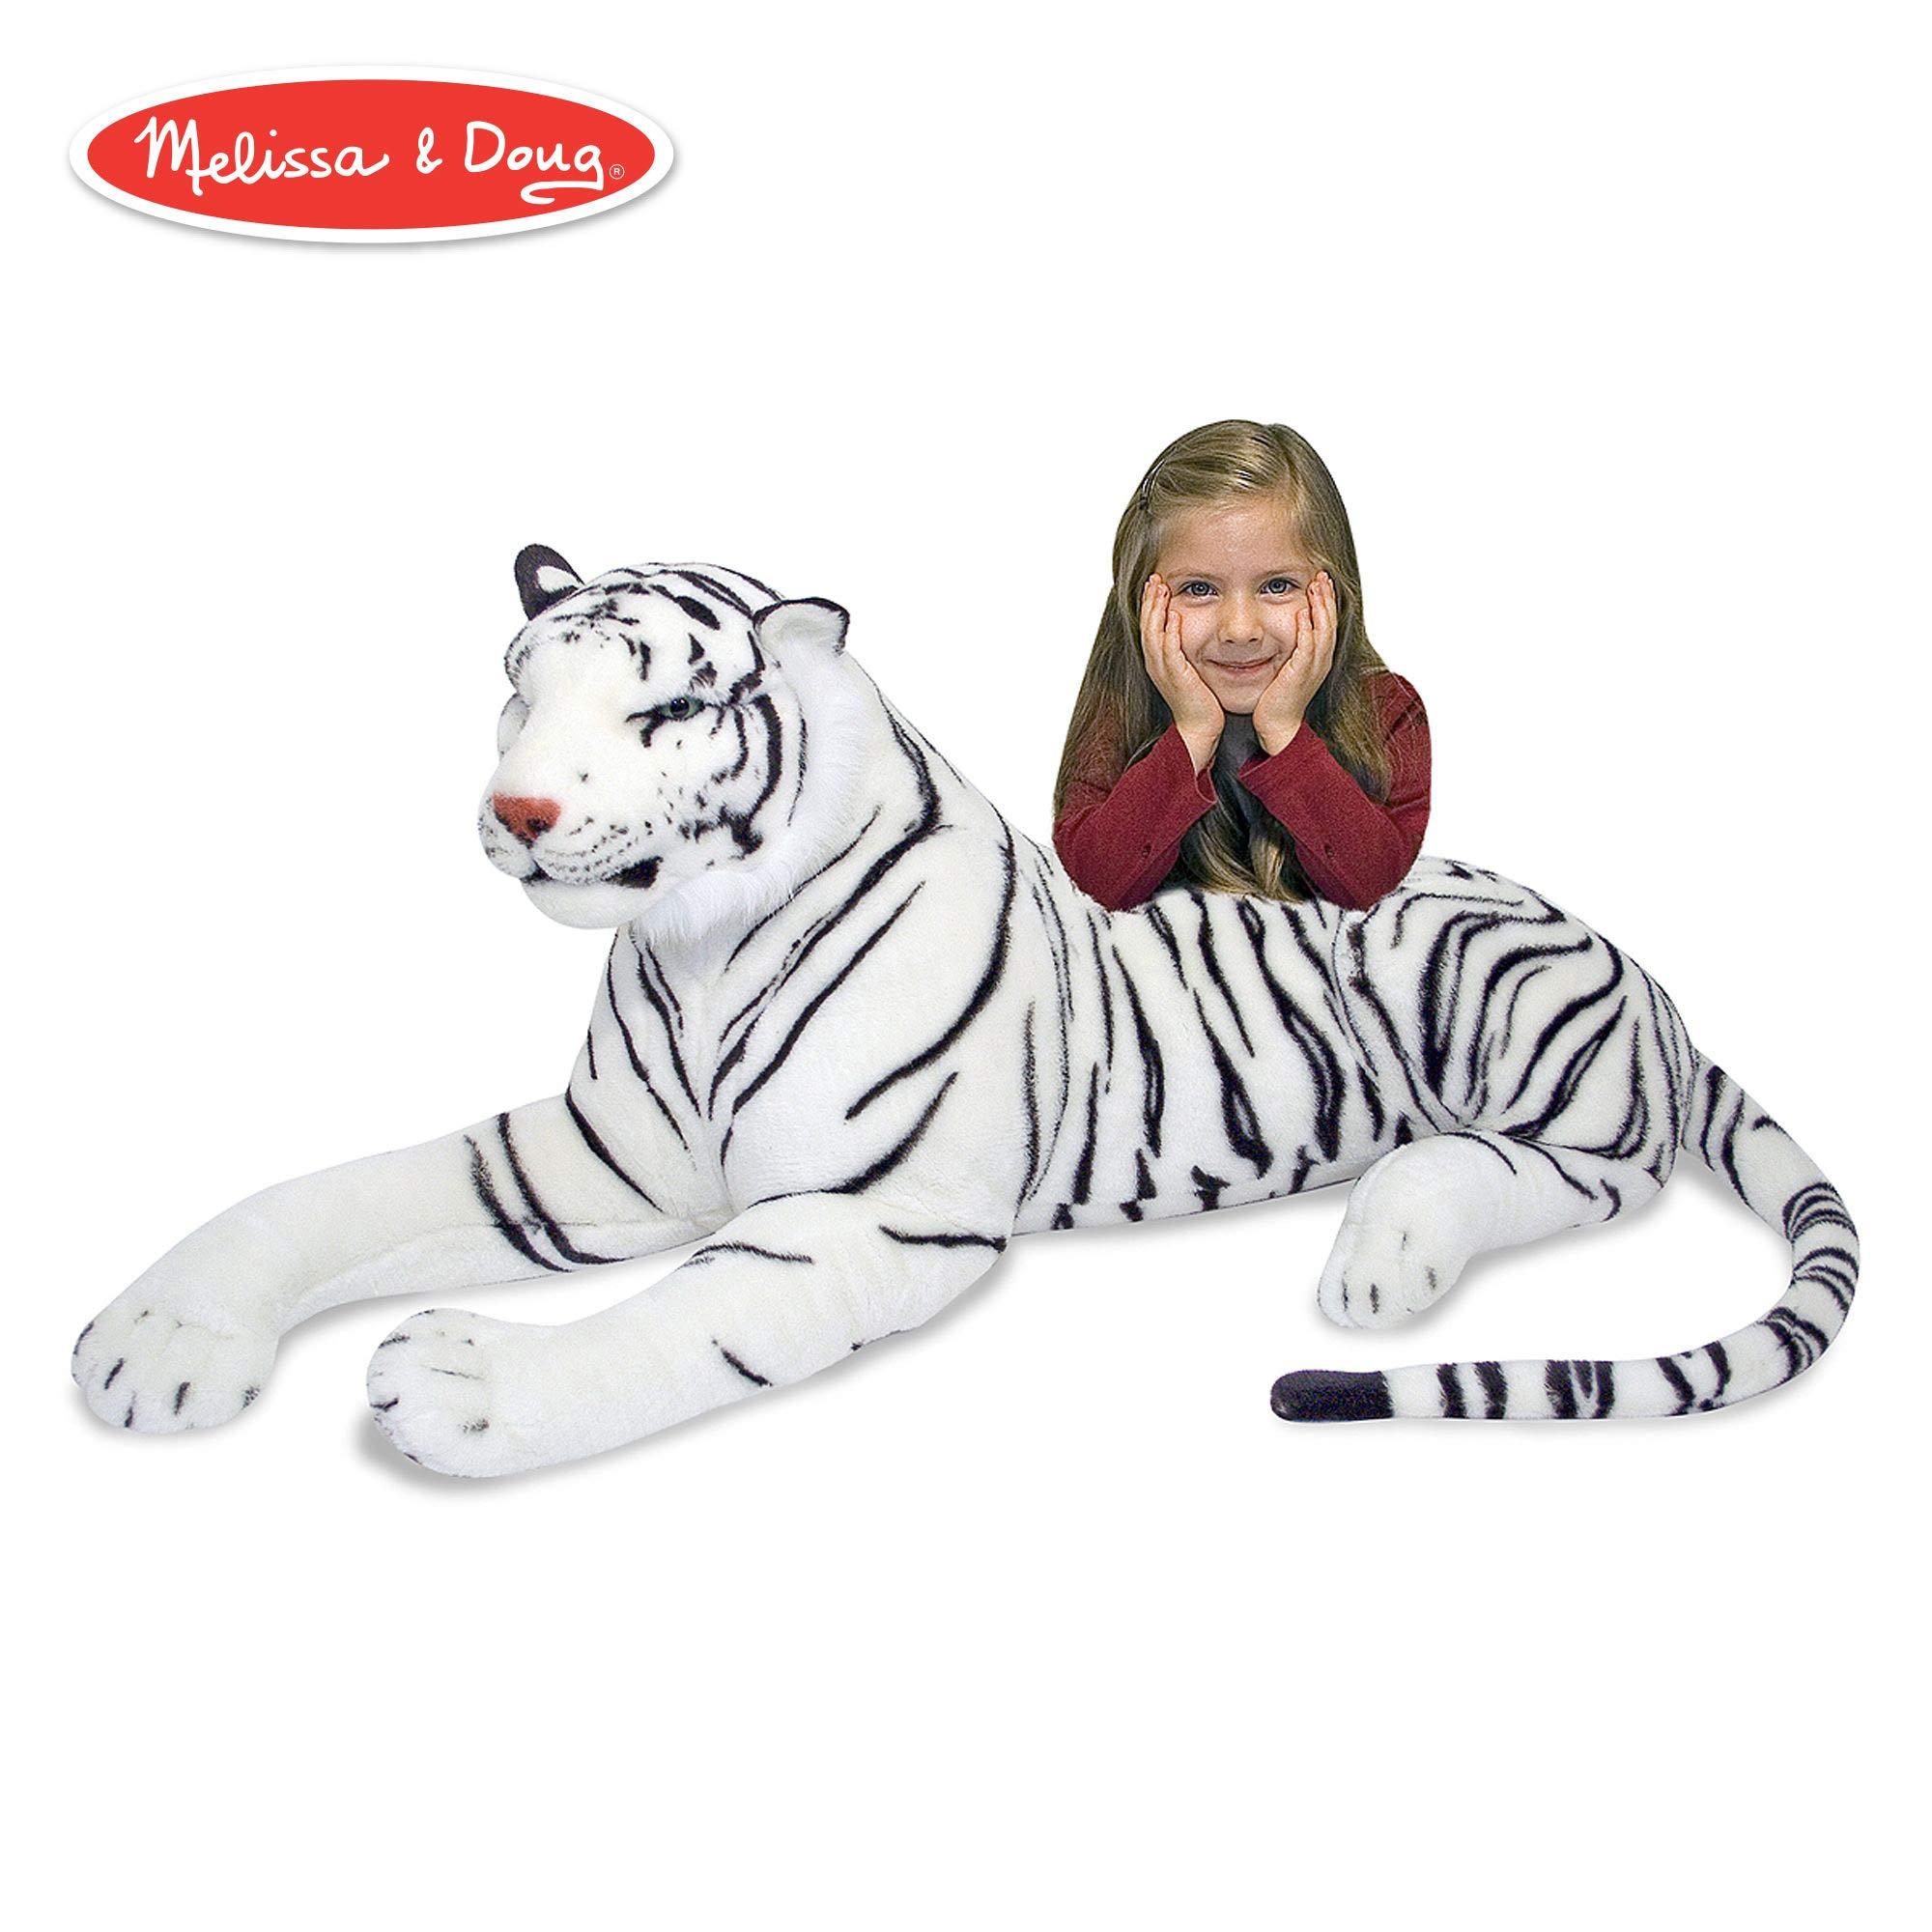 Melissa & Doug White Tiger Giant Stuffed Animal (Wildlife, Soft Fabric, Beautiful Tiger Markings, 20'' H x 65'' L x 20'' W) by Melissa & Doug